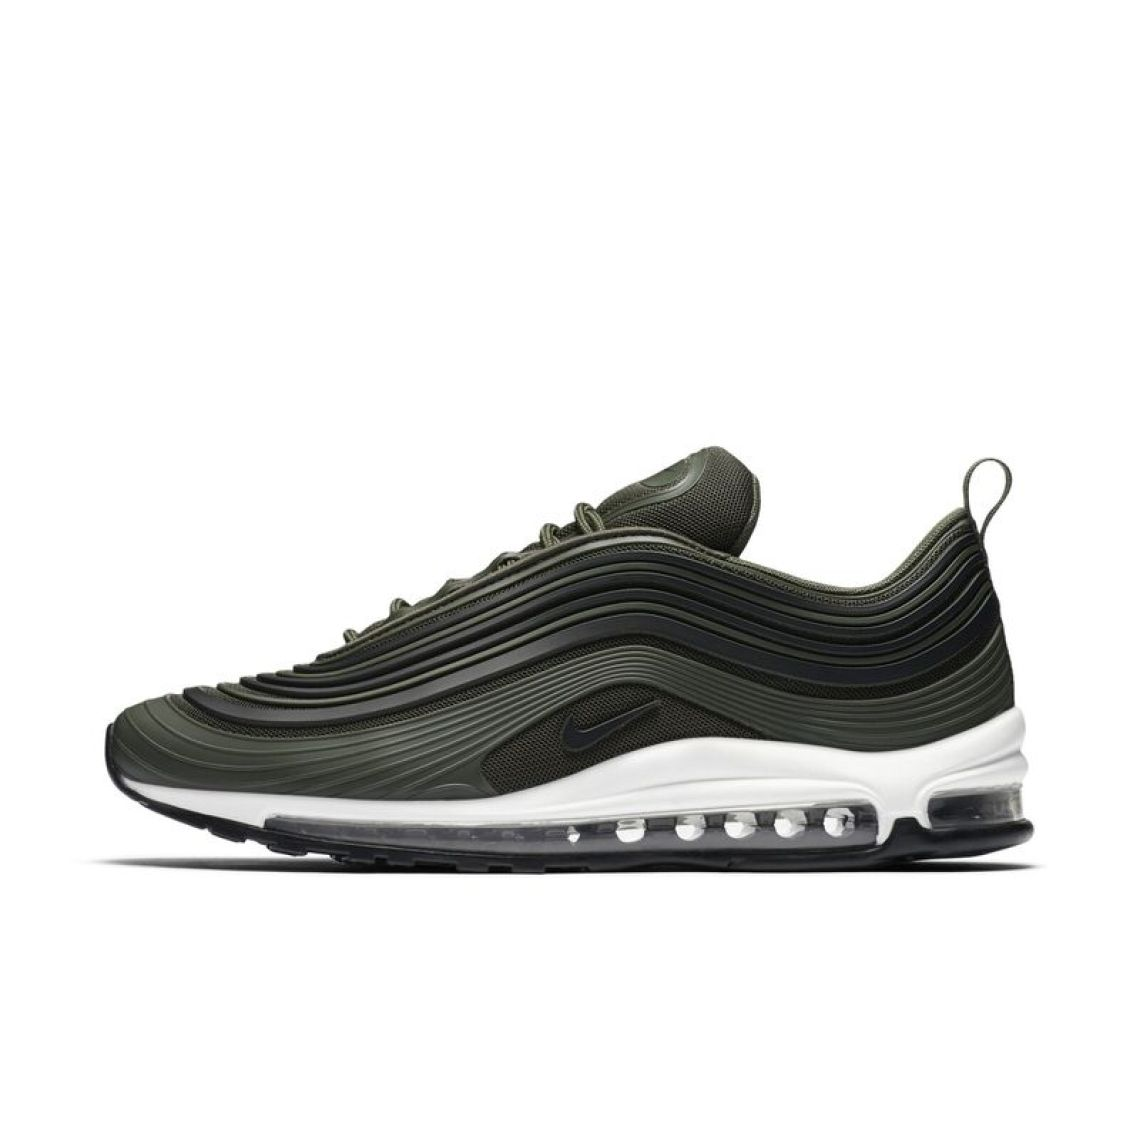 "Nike Air Max 97 Ultra PRM ""Olive"""